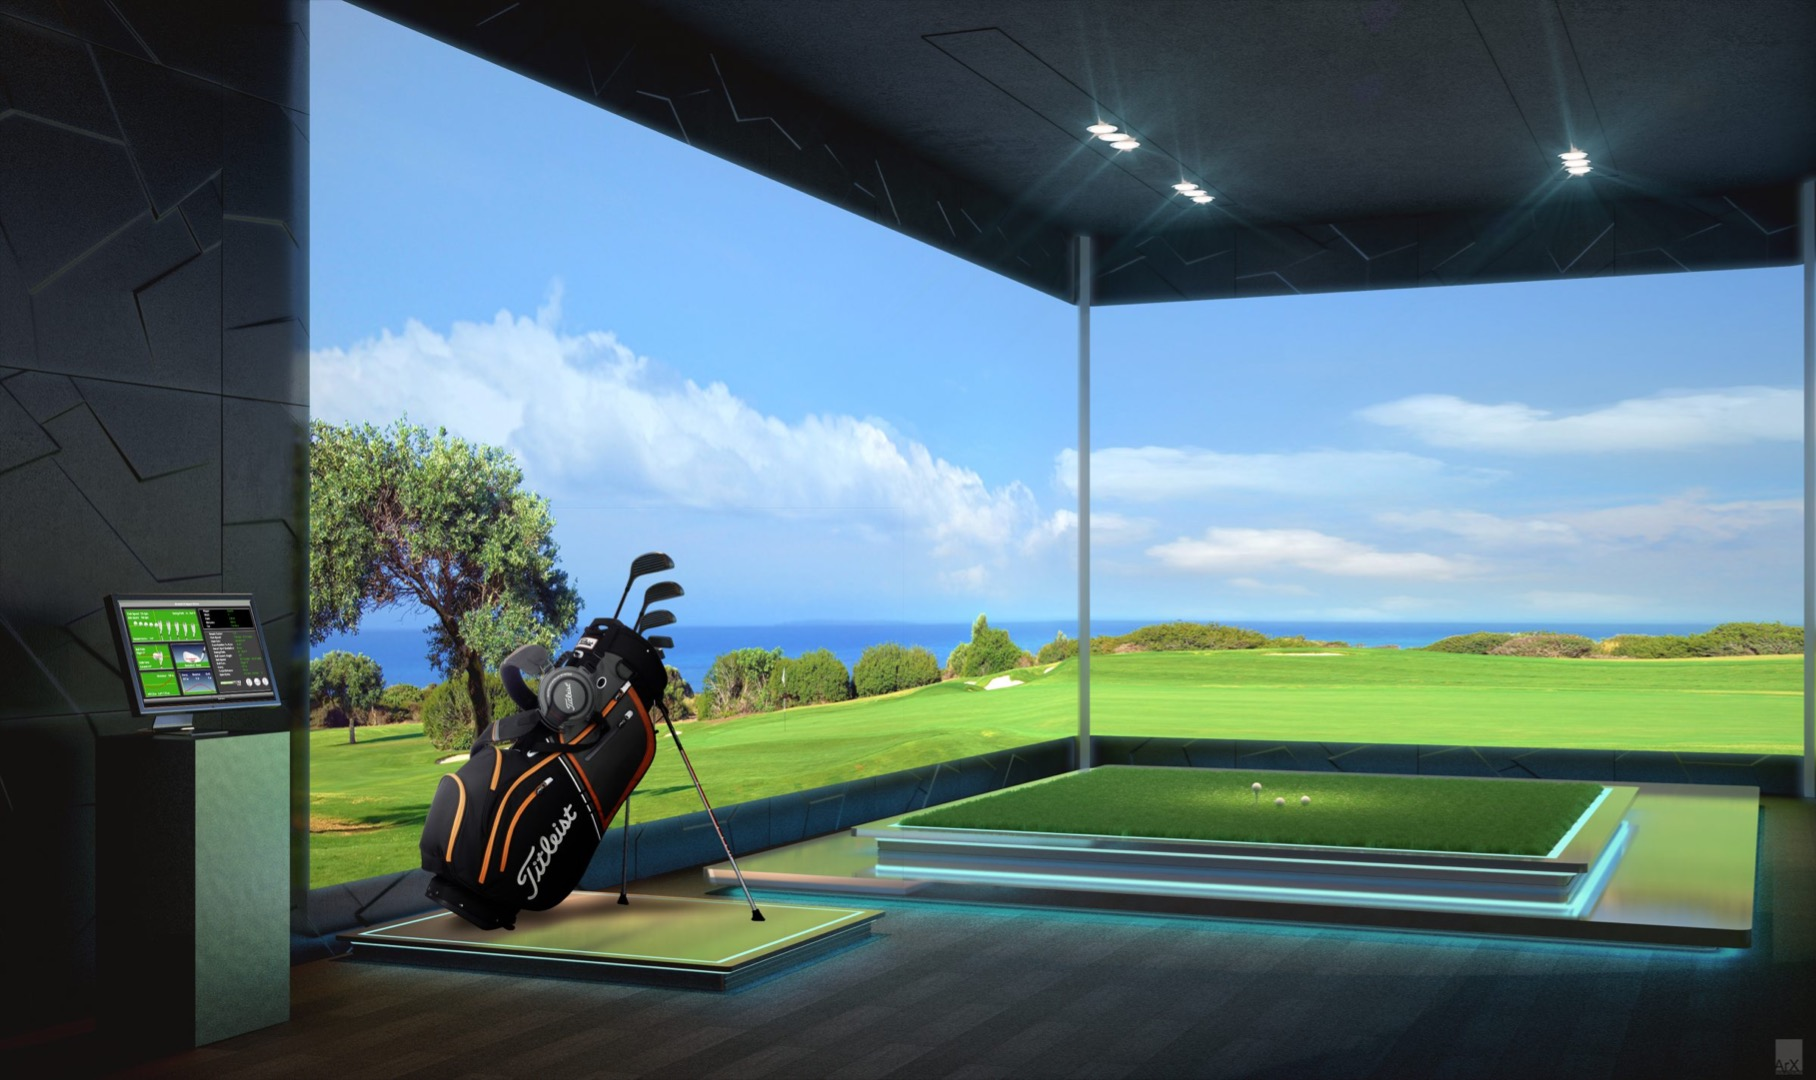 Golf simulator image